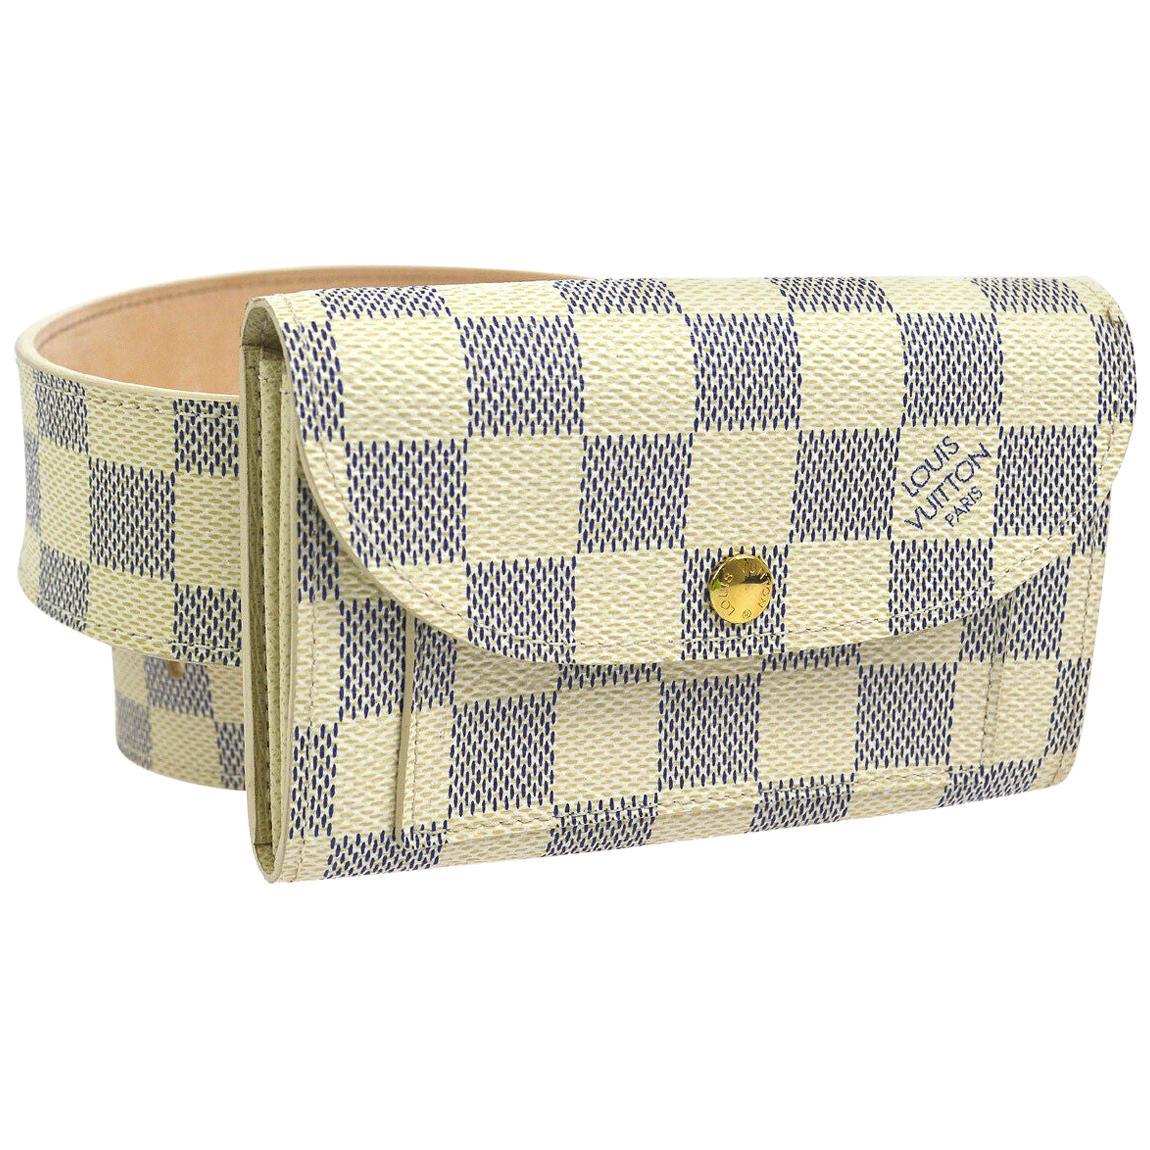 Louis Vuitton White Gray Men's Women's Pouch Bum Fanny Pack Waist Belt Bag